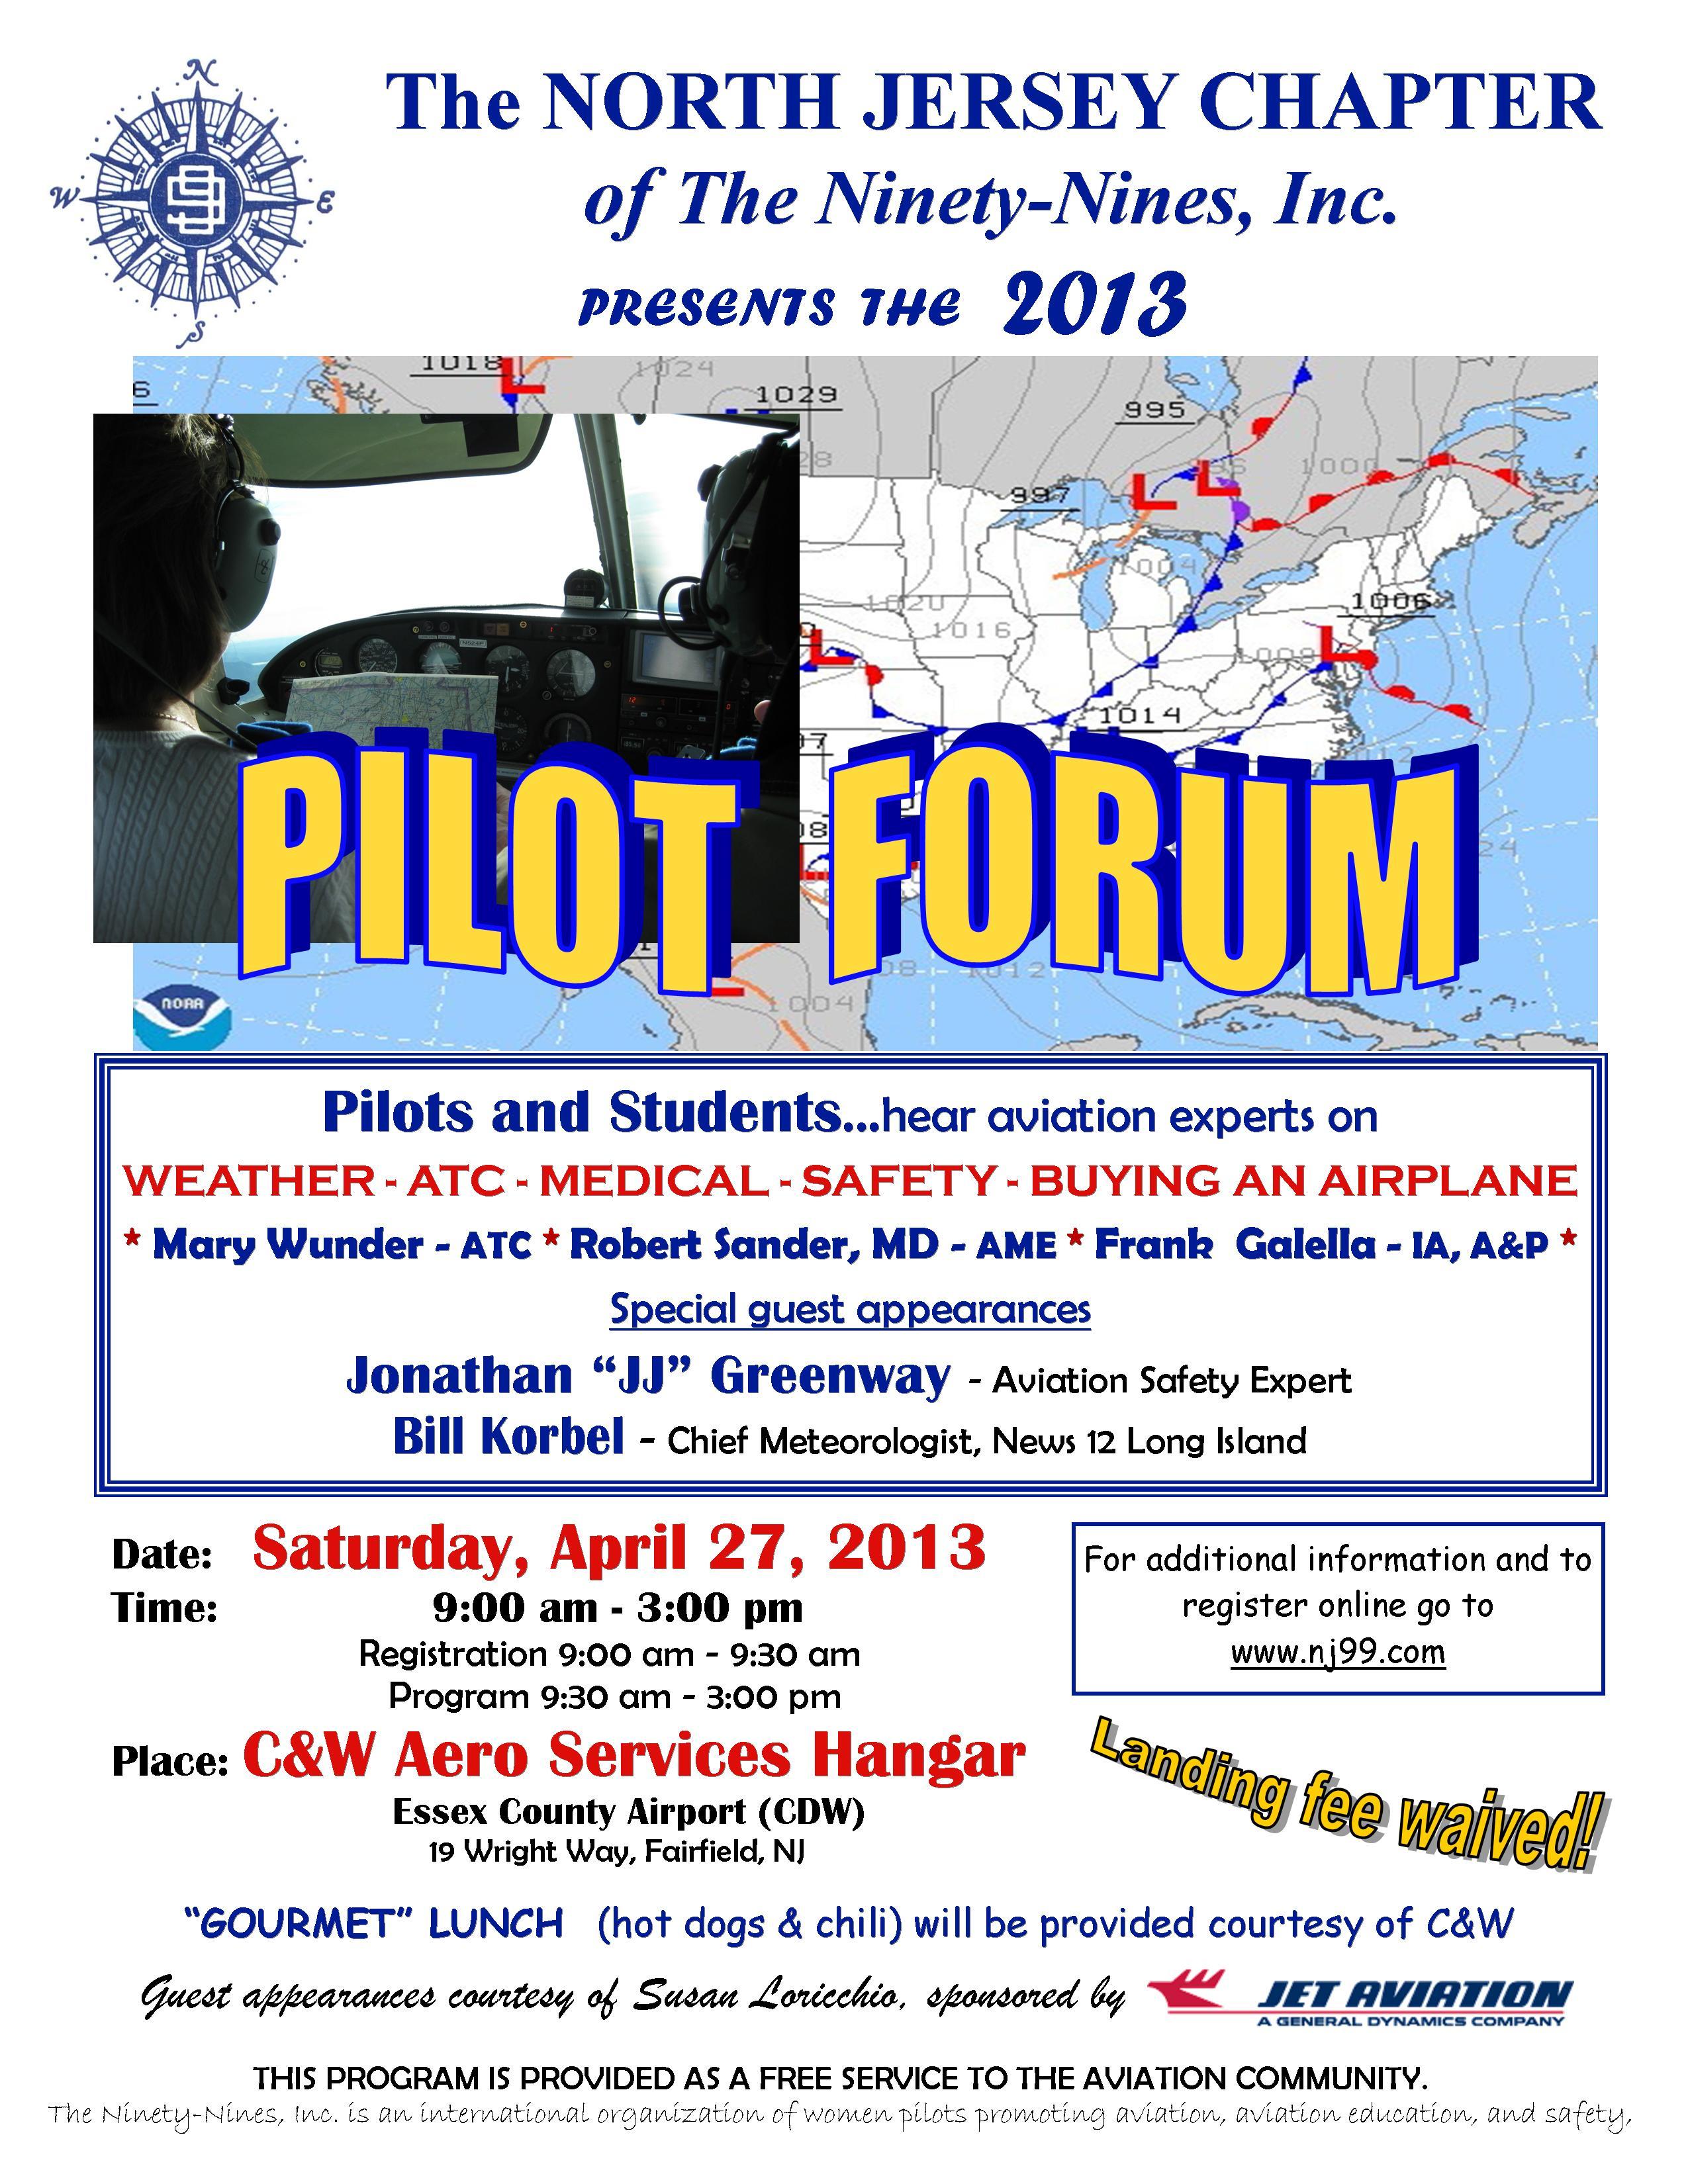 Pilot Forum Flyer